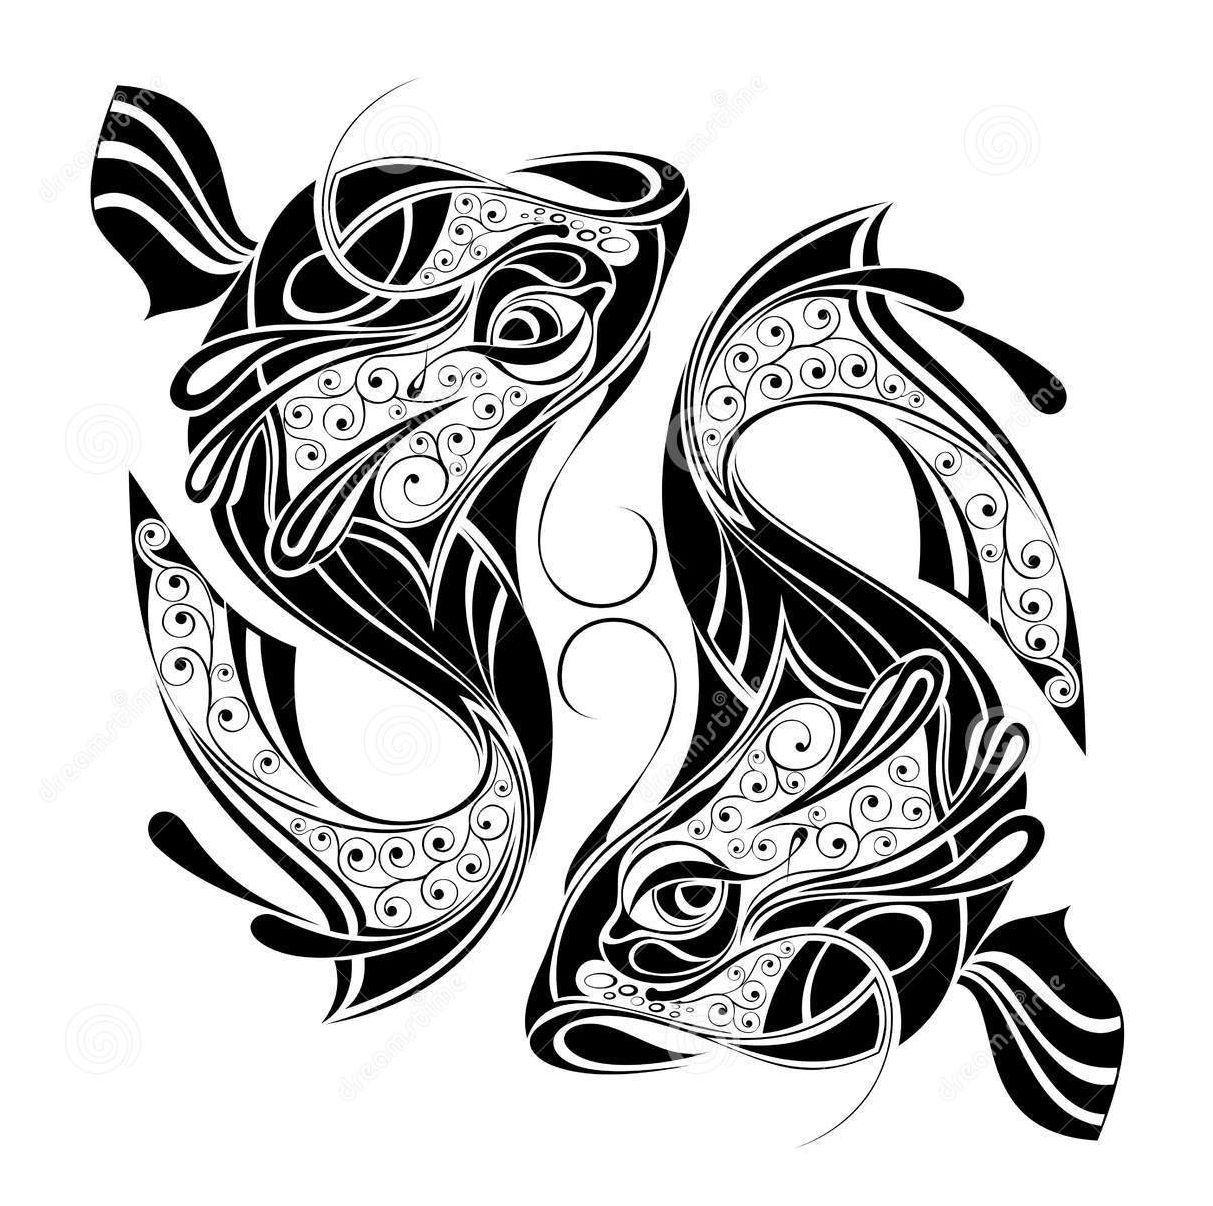 Displaying 19 Gt Images For Aquarius Animal Symbol Gemini Tattoo Gemini Zodiac Tattoos Pisces Tattoo Designs